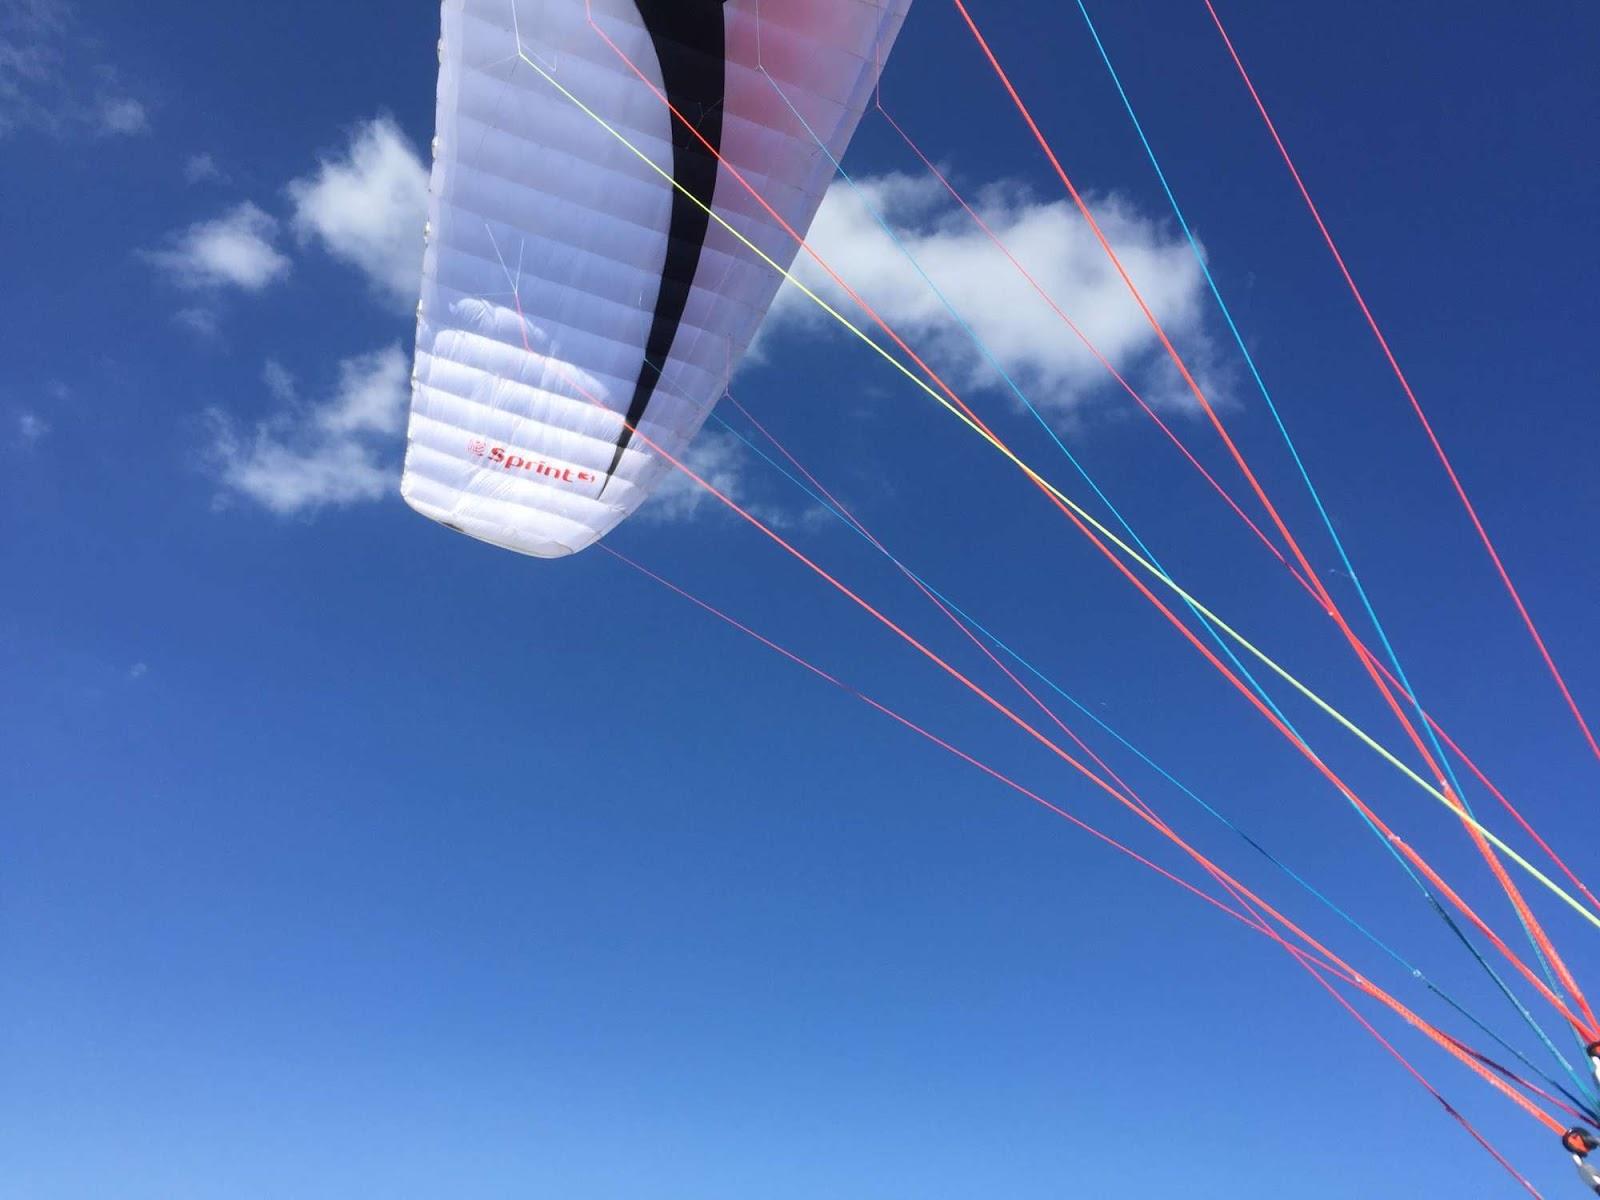 Lightweight paraglider wings